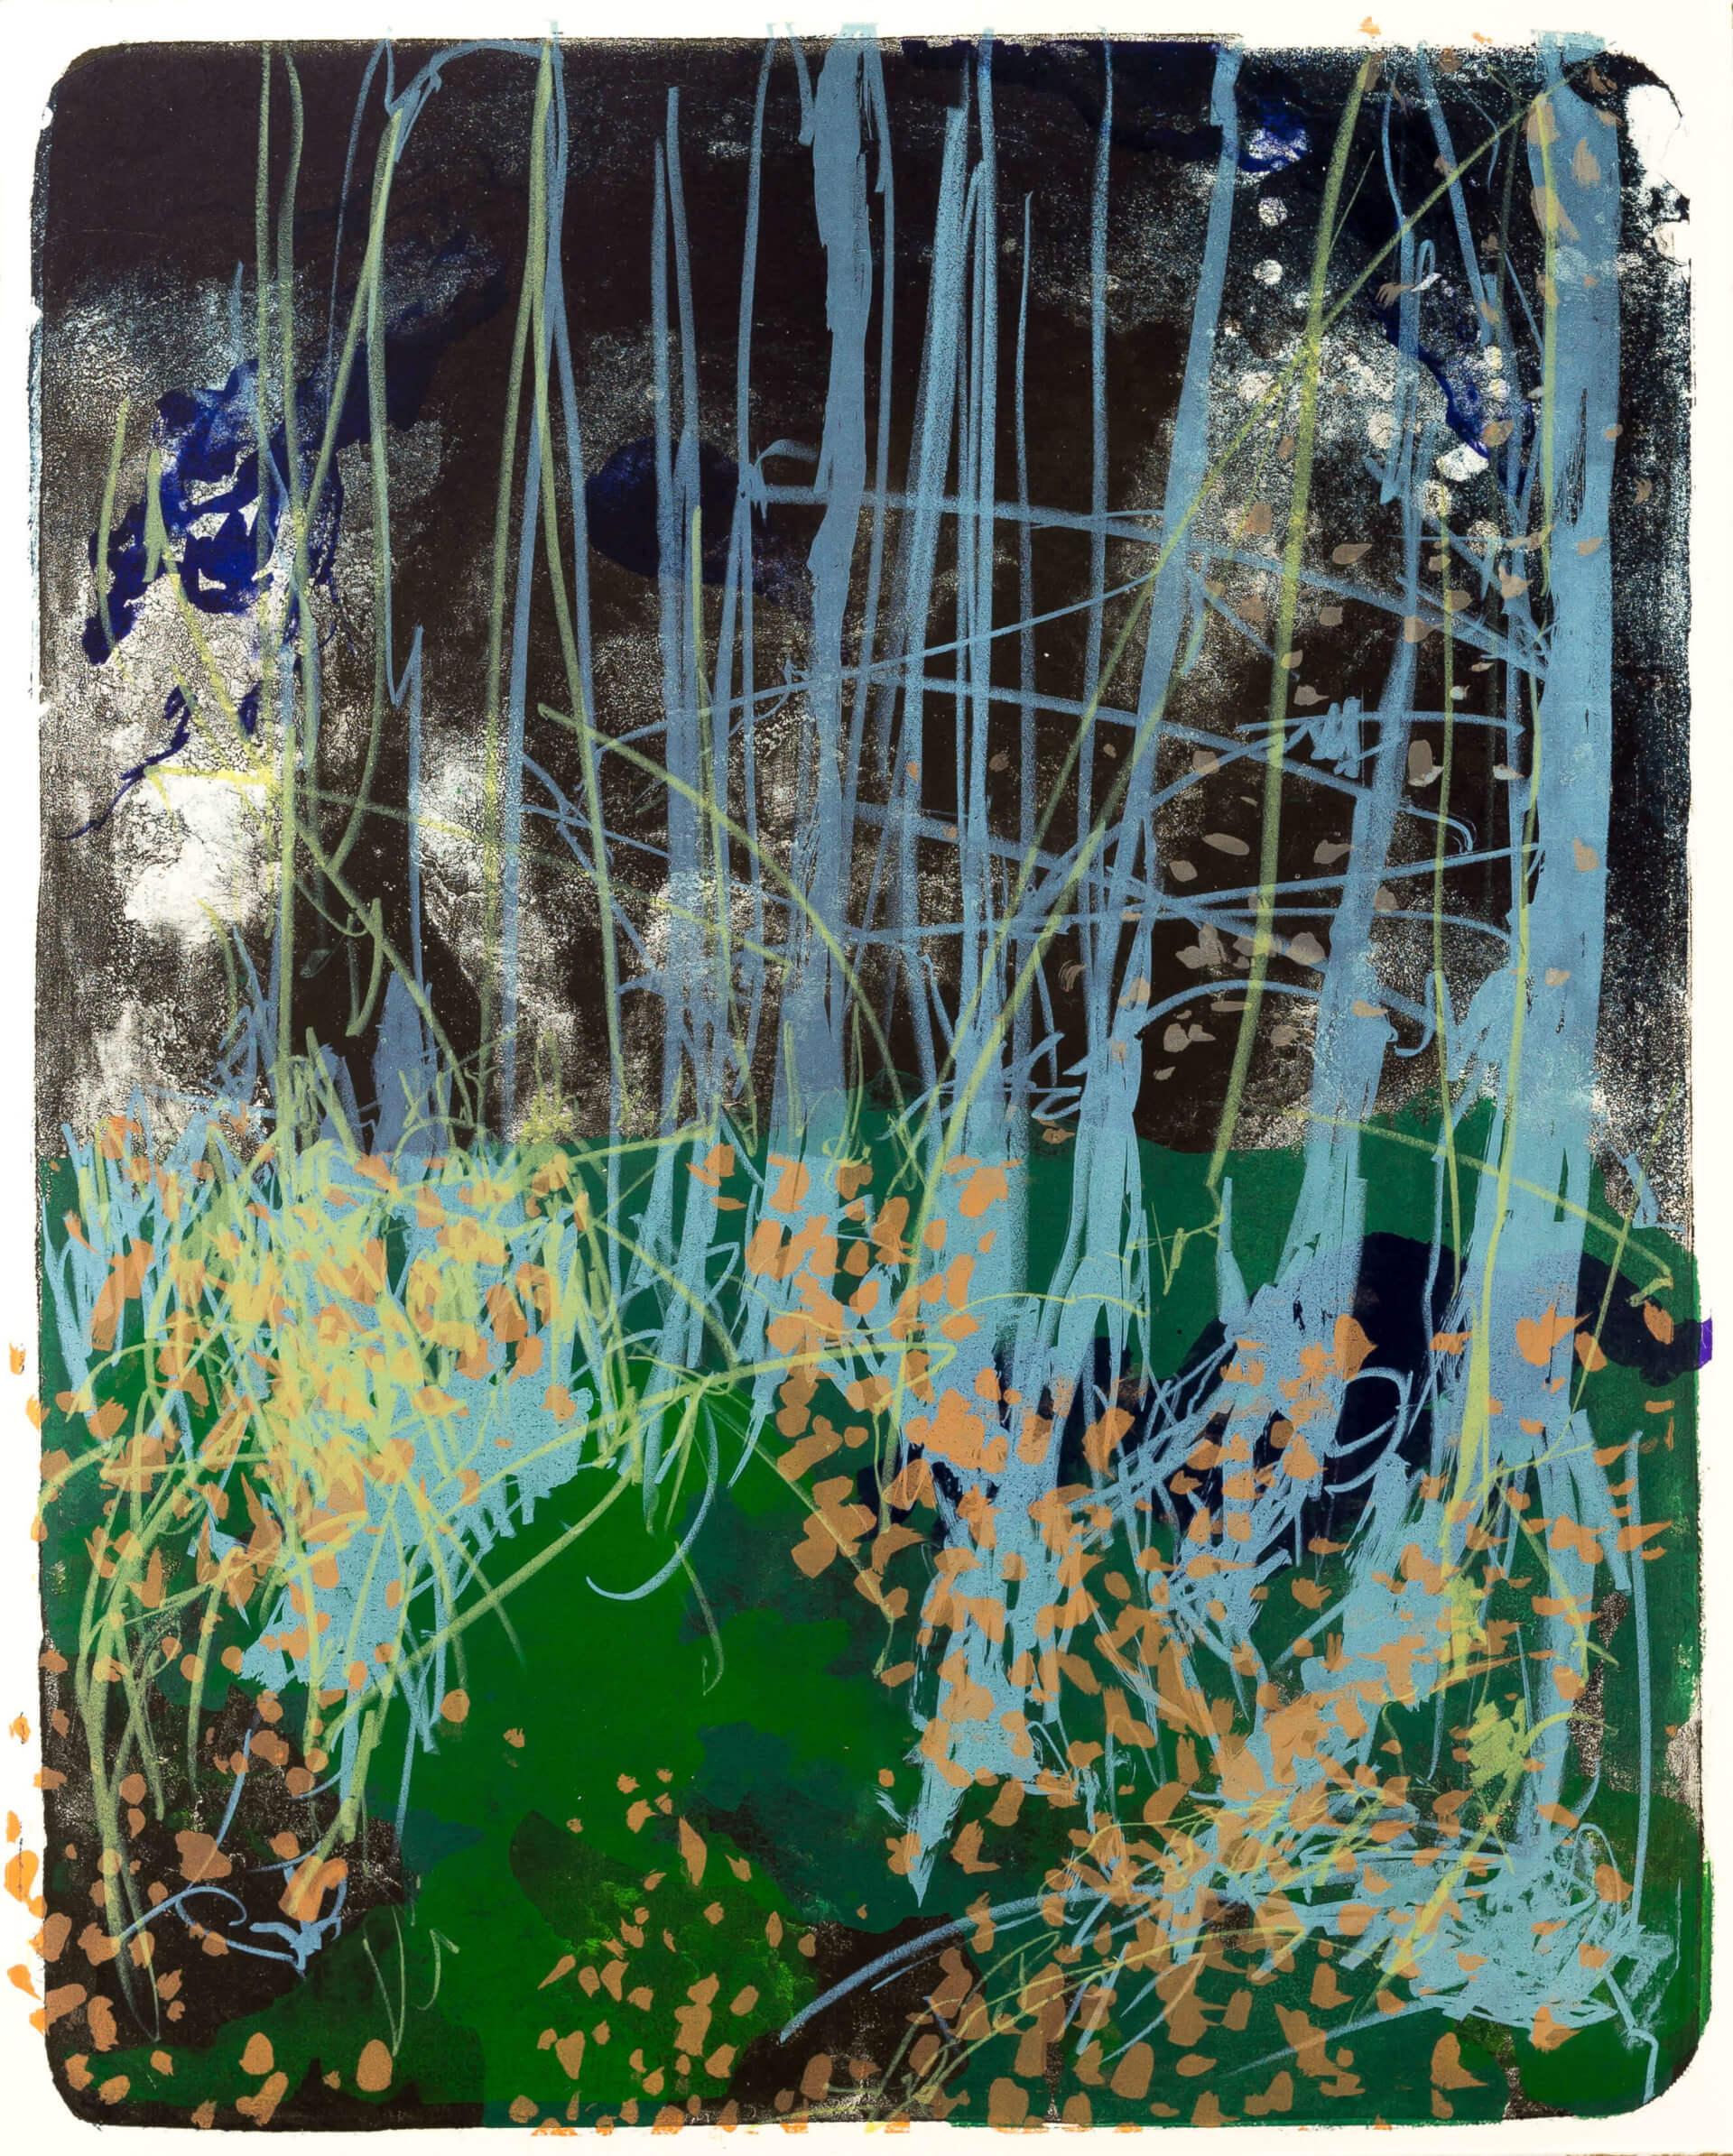 Katharina Albers, Wald X(N)-XIV, 2015, Farblithographie, Unikat, 50x40 cm